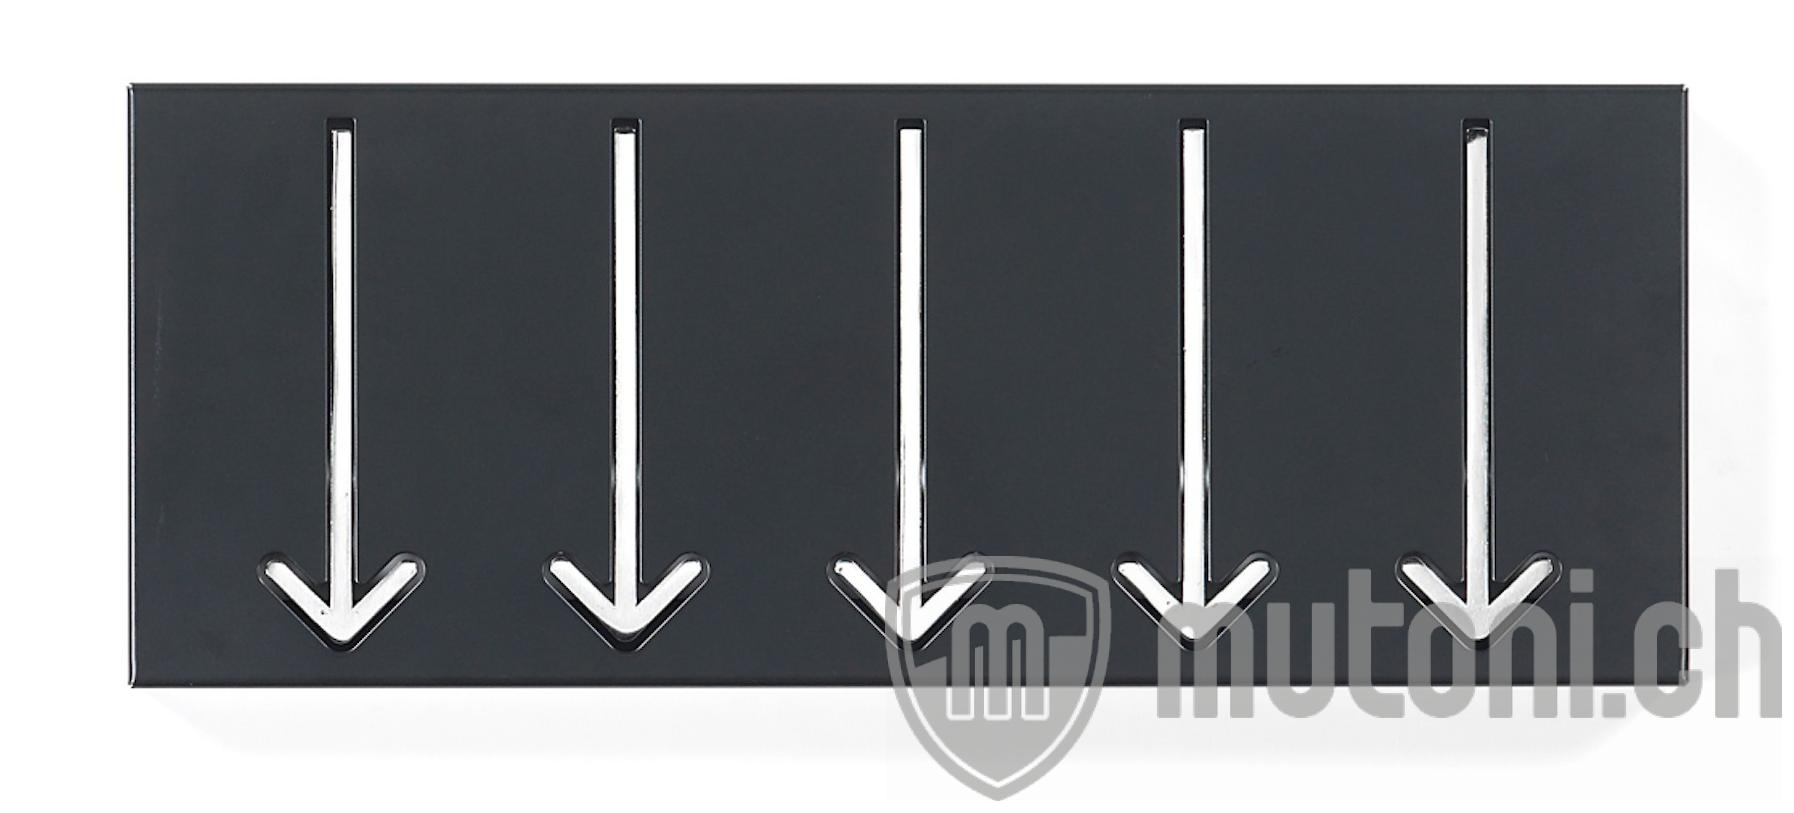 wandgarderobe pfeil 44x17 schwarz mutoni design mutoni. Black Bedroom Furniture Sets. Home Design Ideas